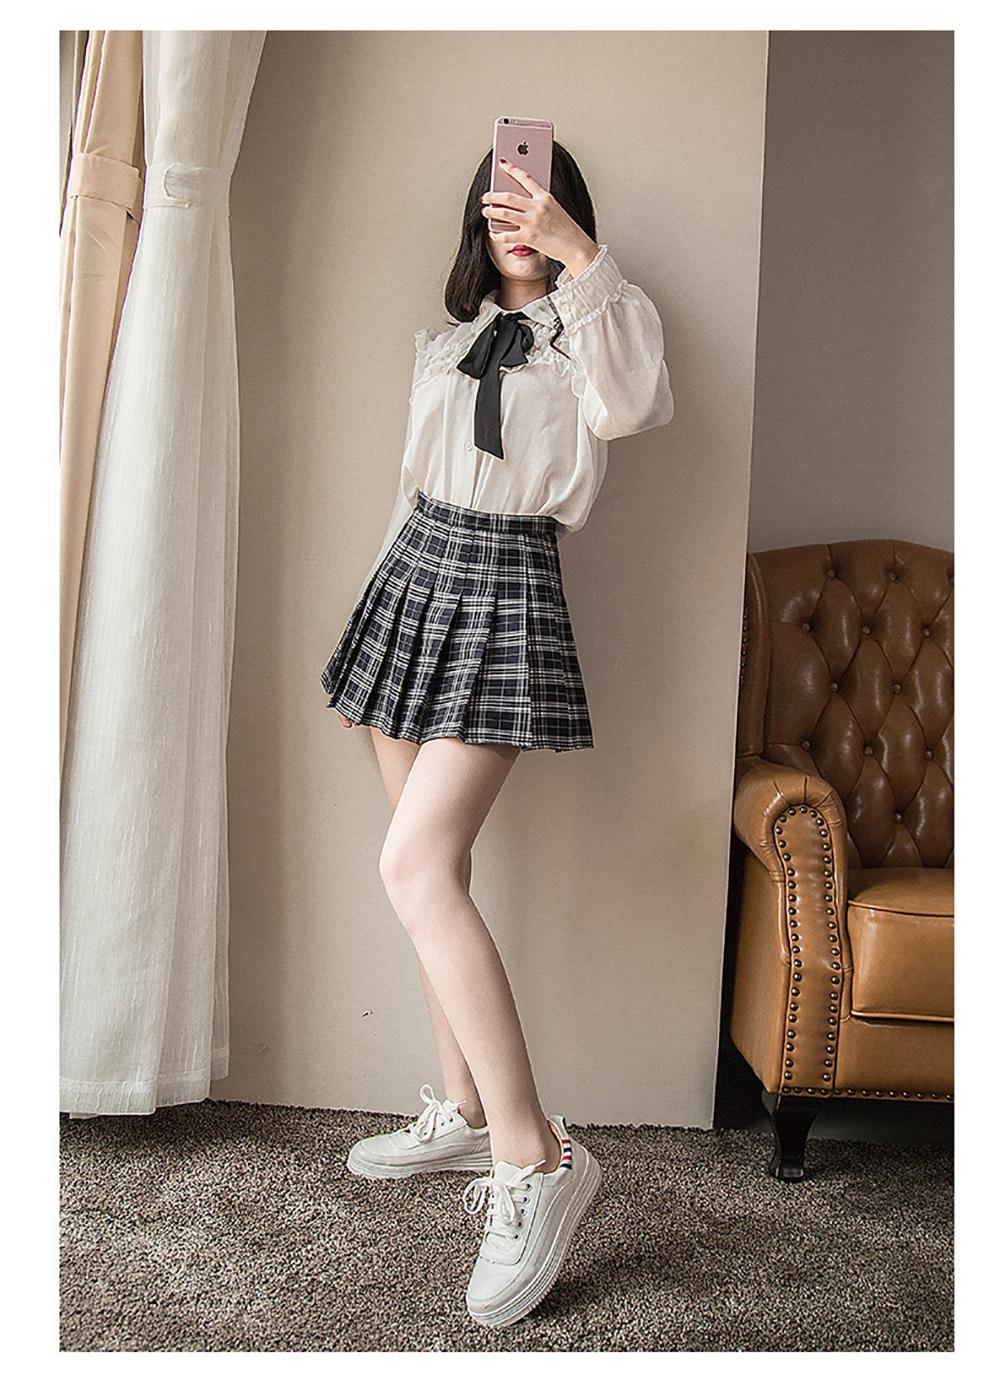 Plus Size Harajuku Short Skirt New Korean Plaid Skirt Women Zipper High Waist School Girl Pleated Plaid Skirt Sexy Mini Skirt 6